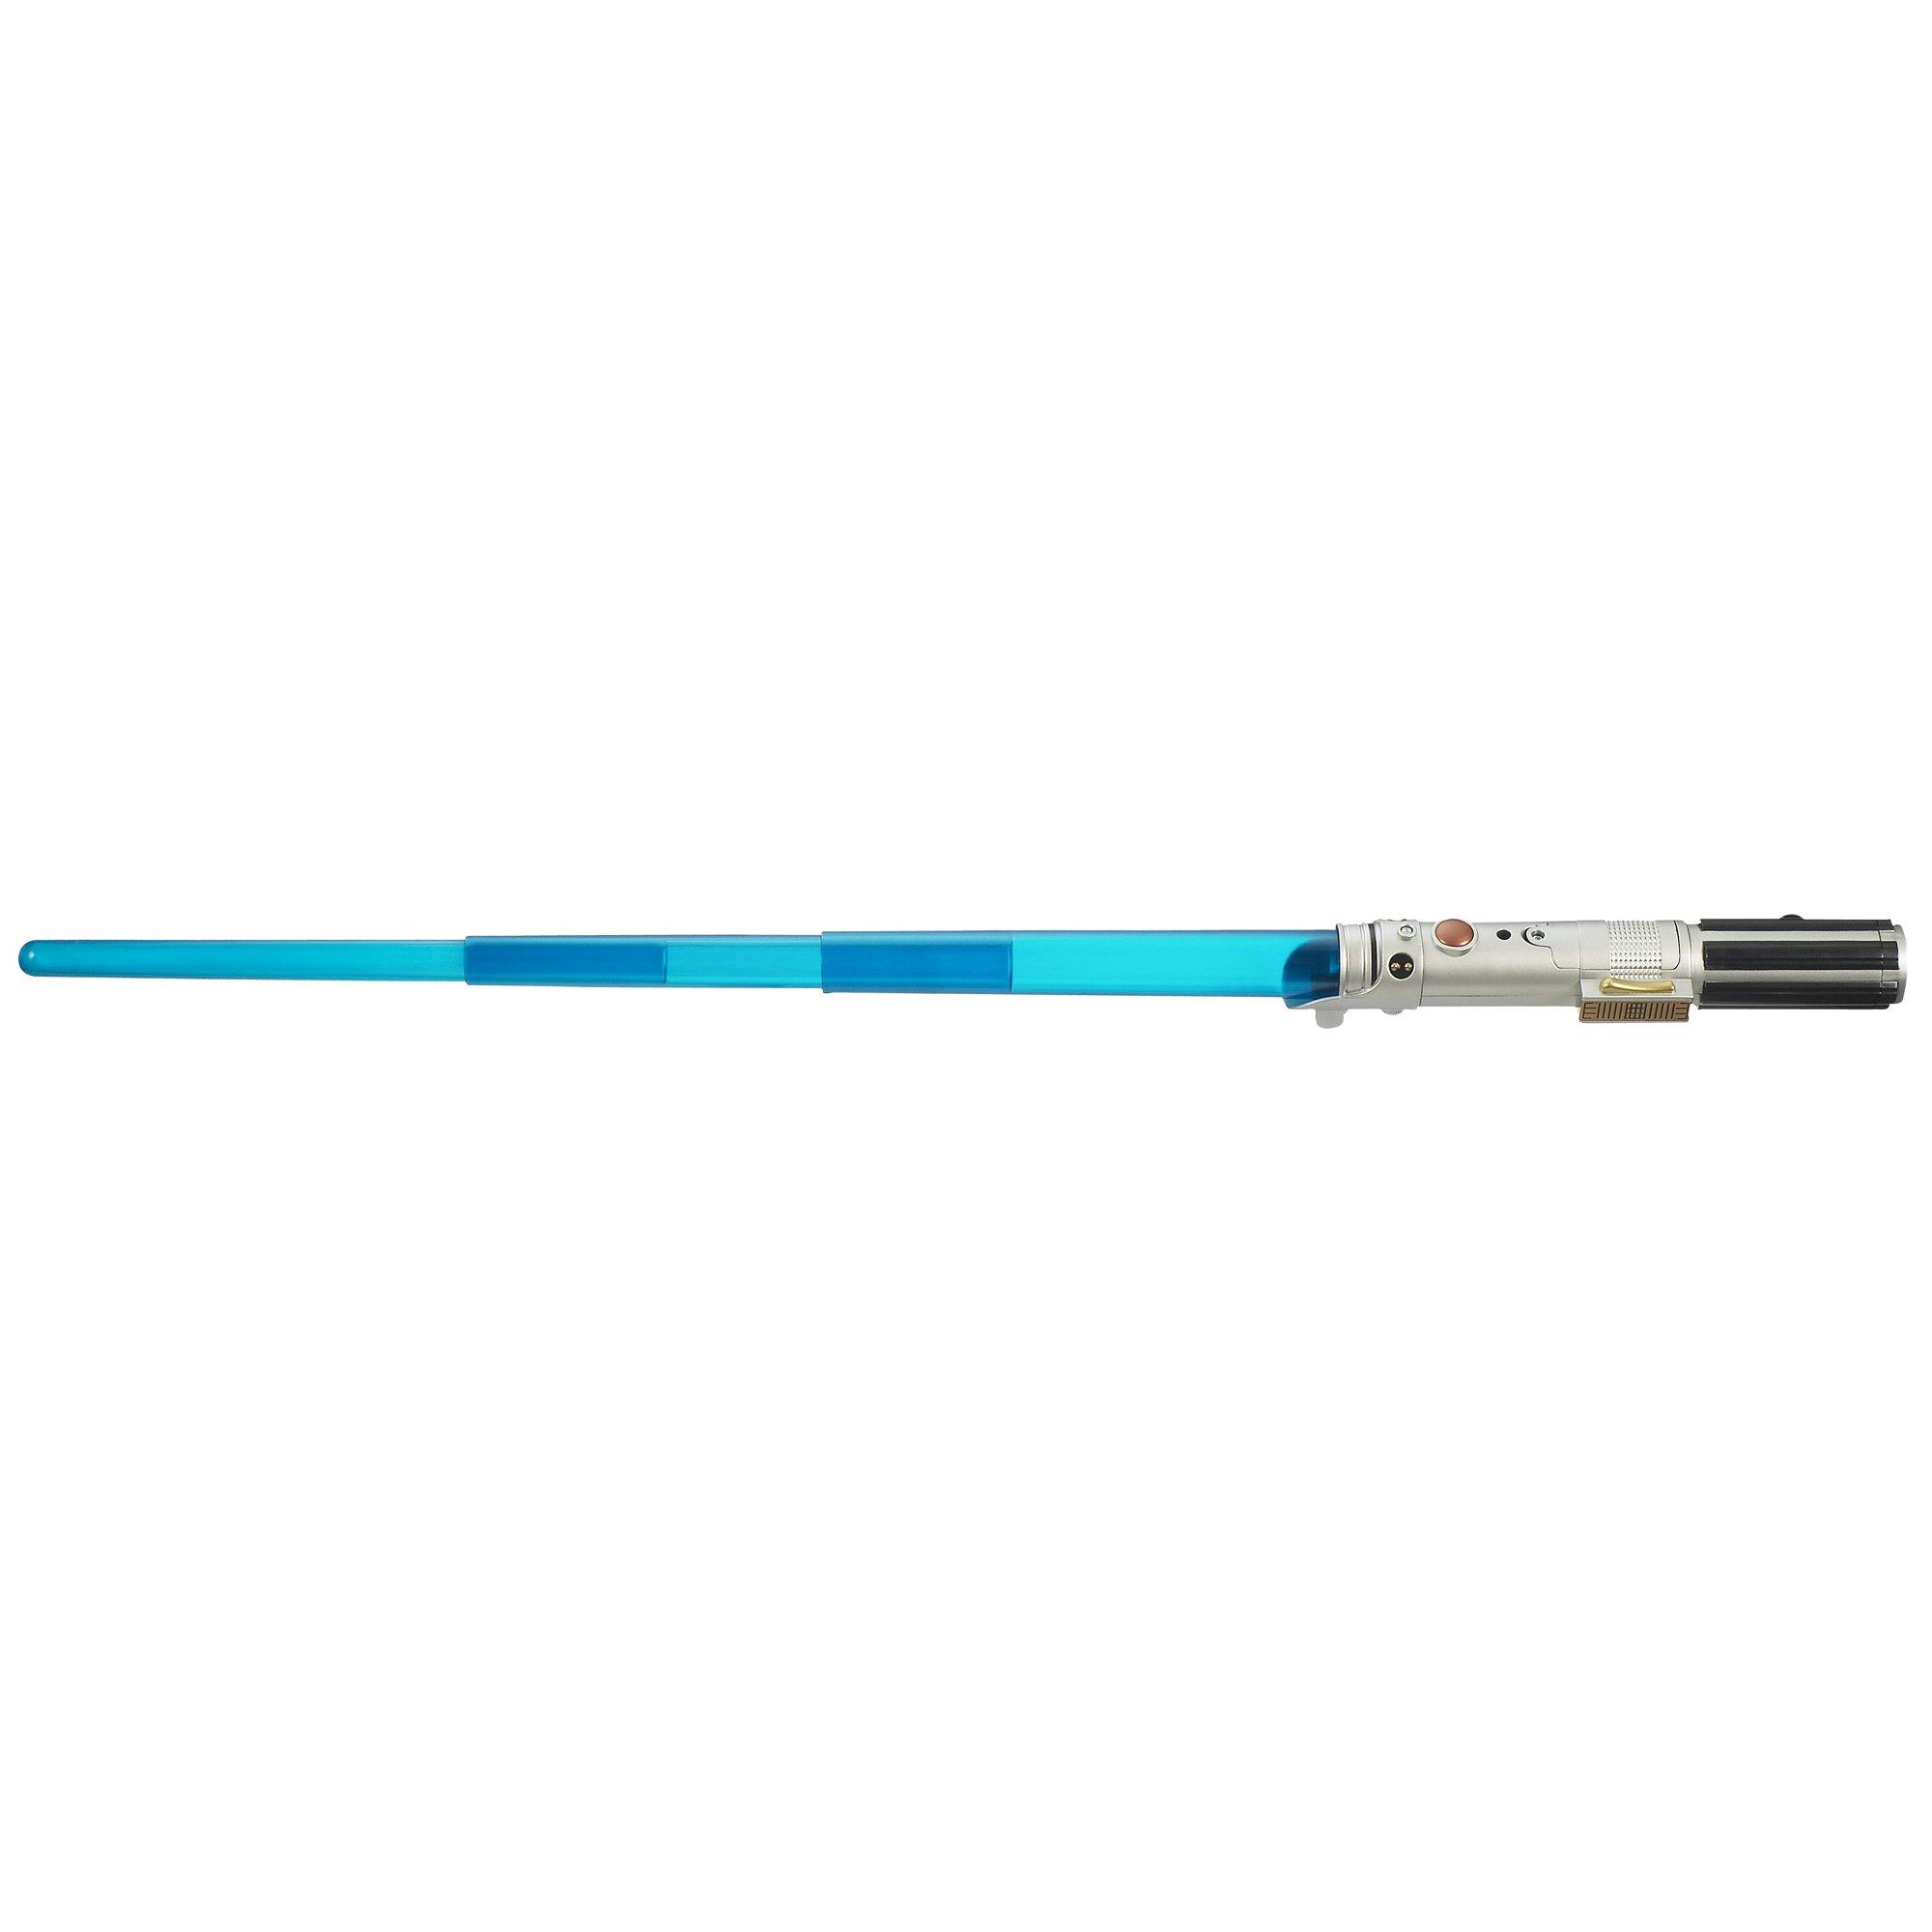 Star Wars Force Tech Anakin Skywalker Electronic Lightsaber Toy